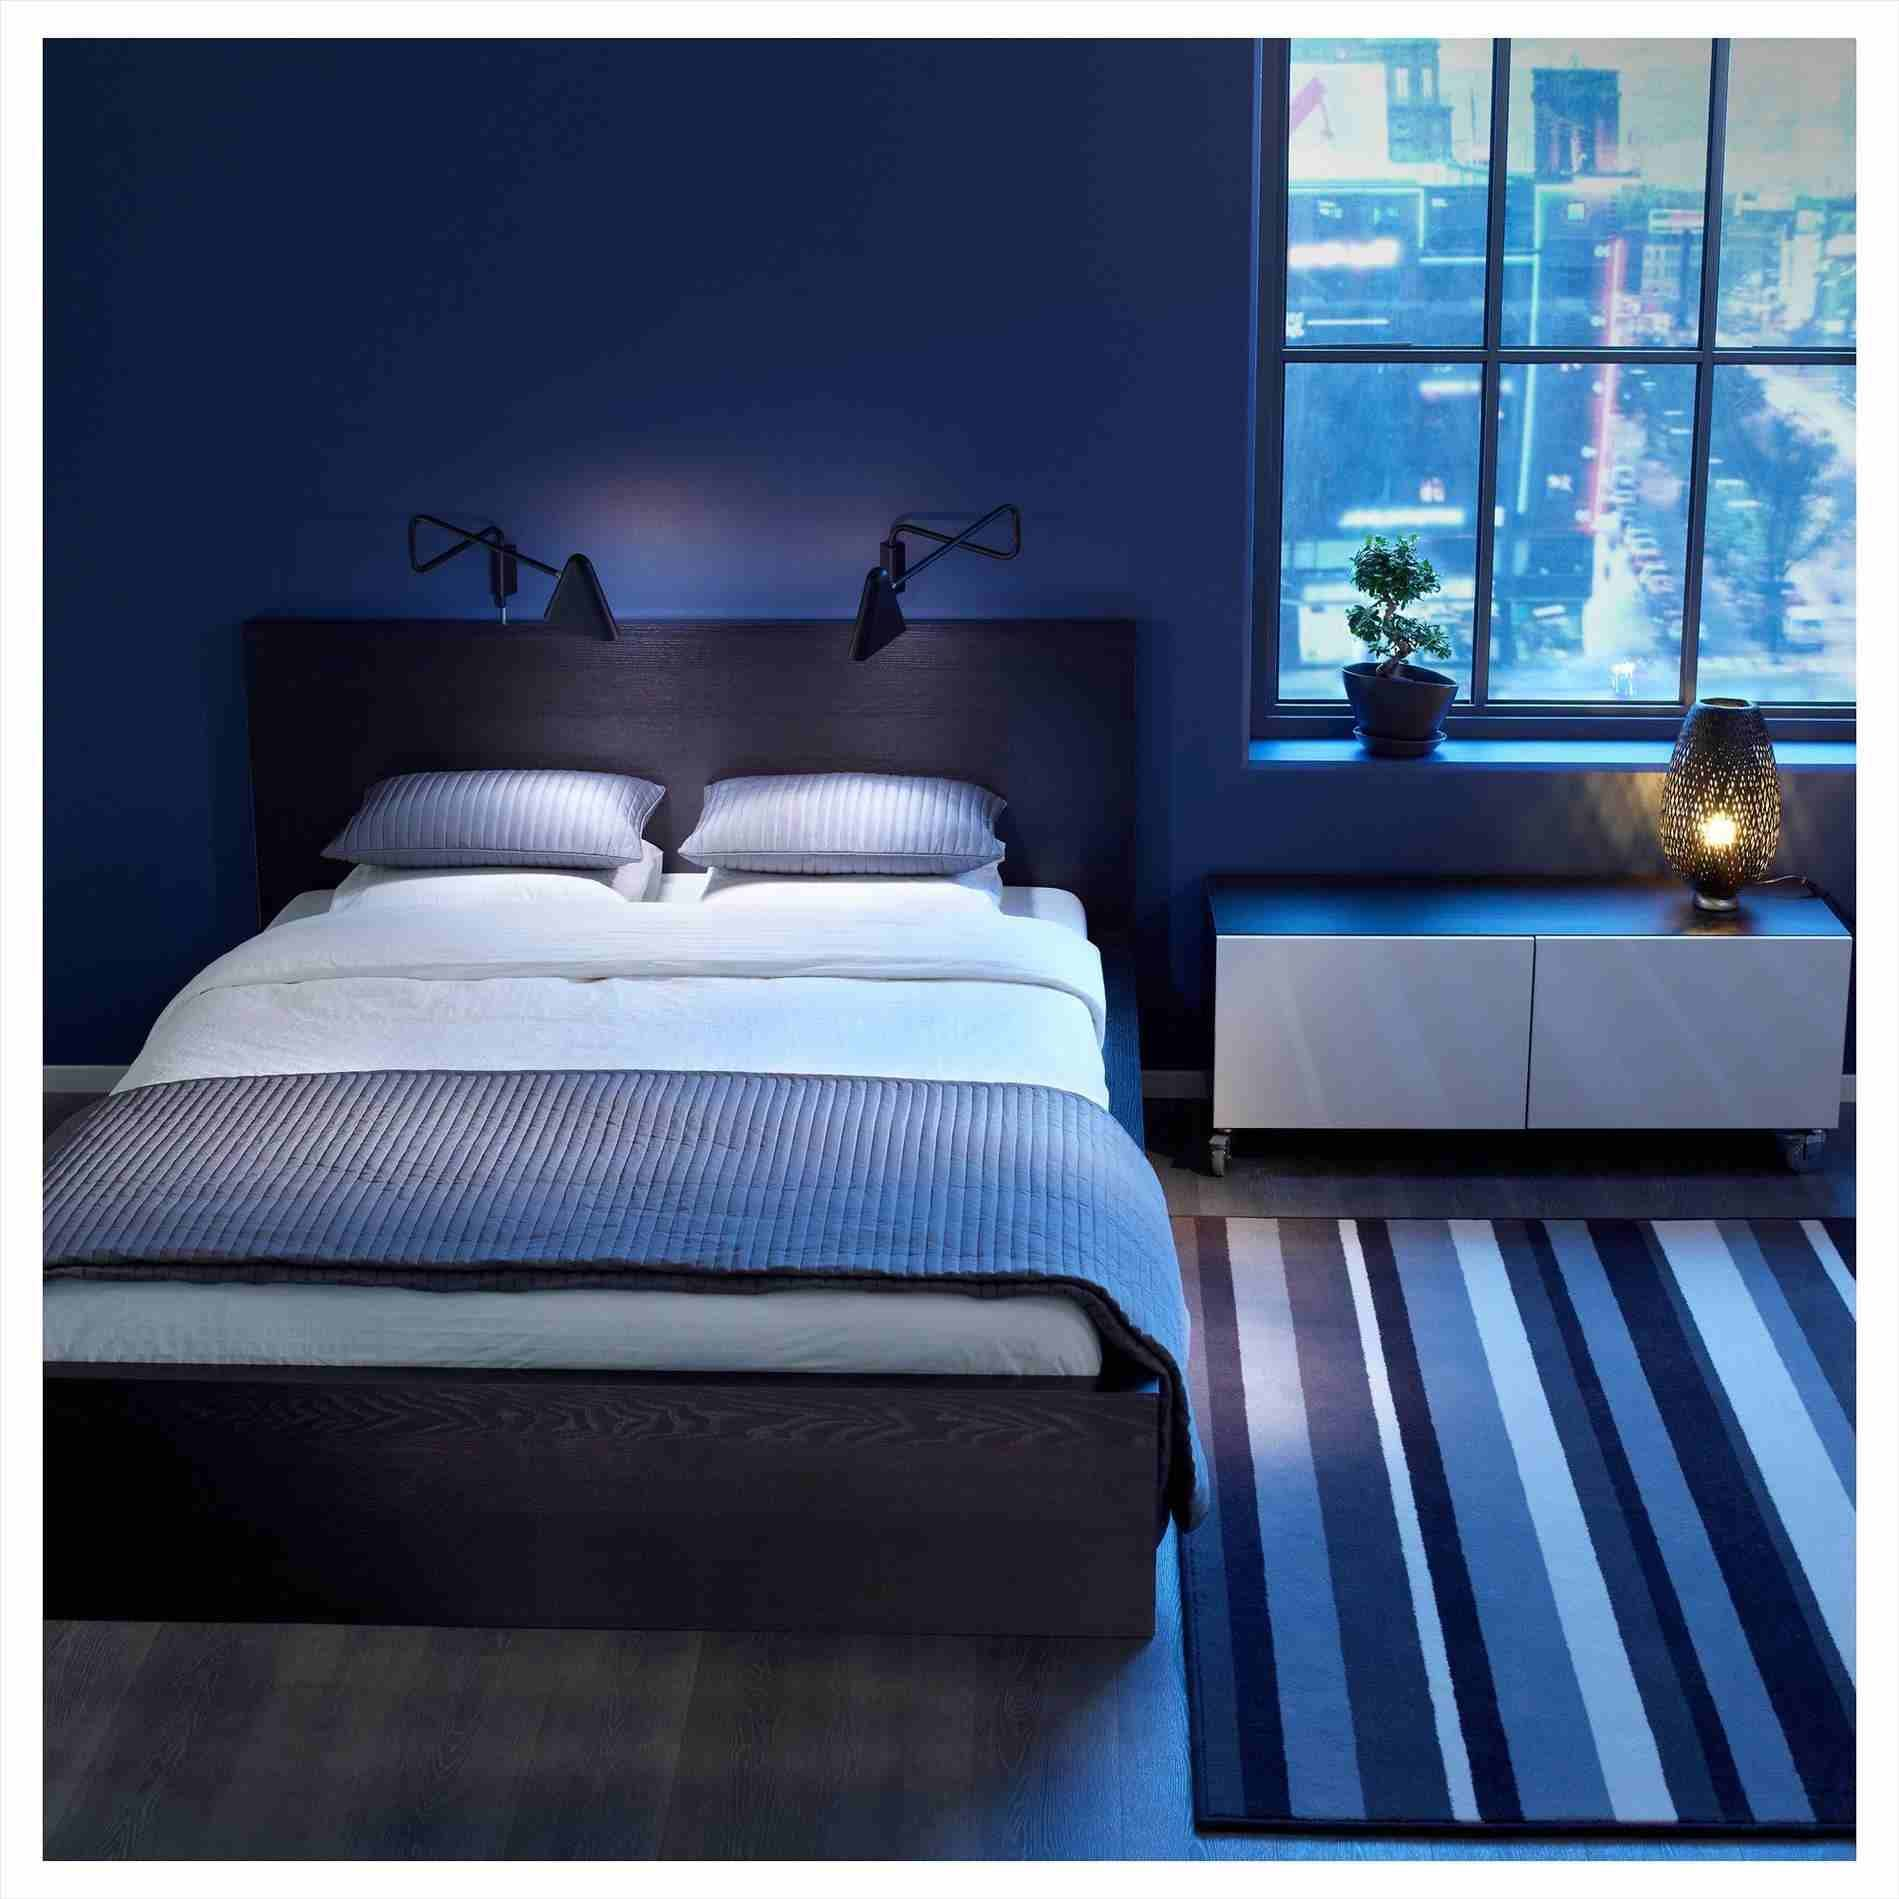 Small Bedroom Designs For Men | Small bedroom ideas for ... on Small Room Ideas For Guys  id=59722